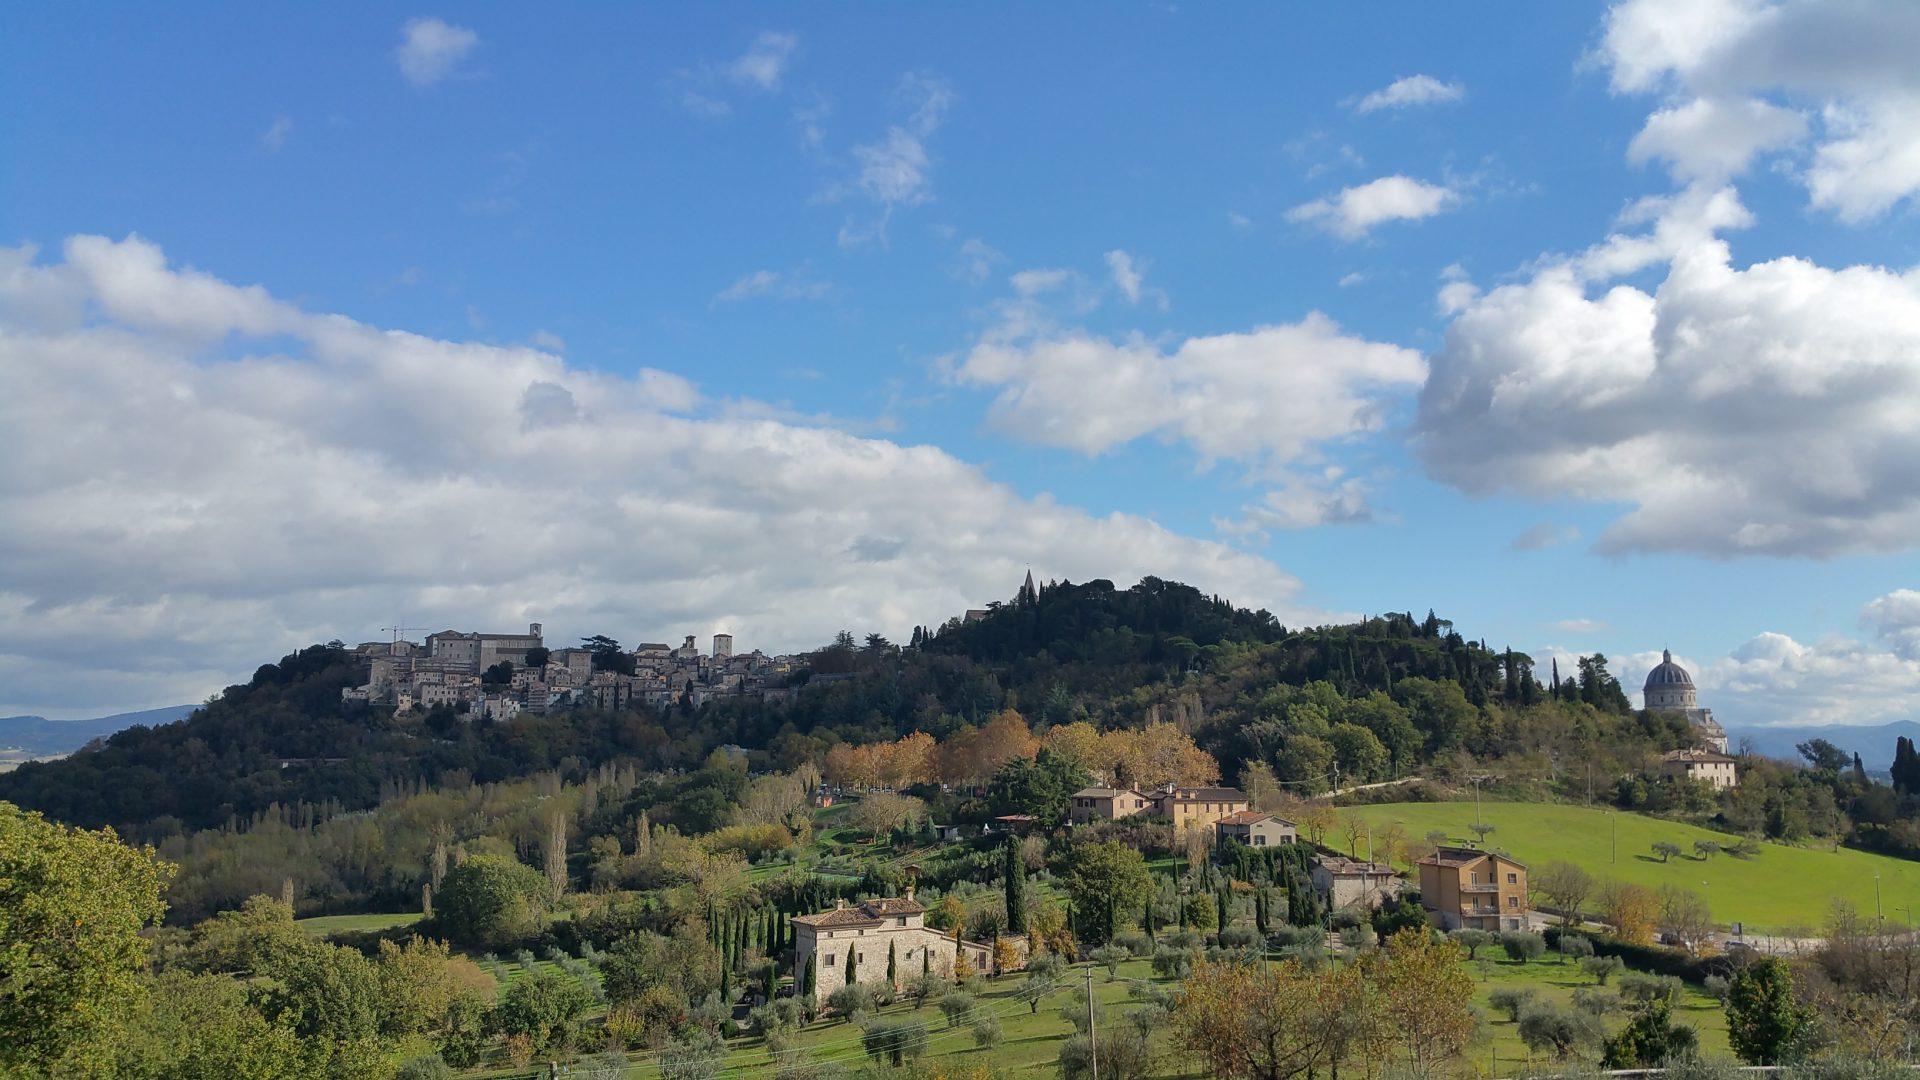 Hotel Fonte Cesia-Todi - Miglior tariffa garantita - best available rate